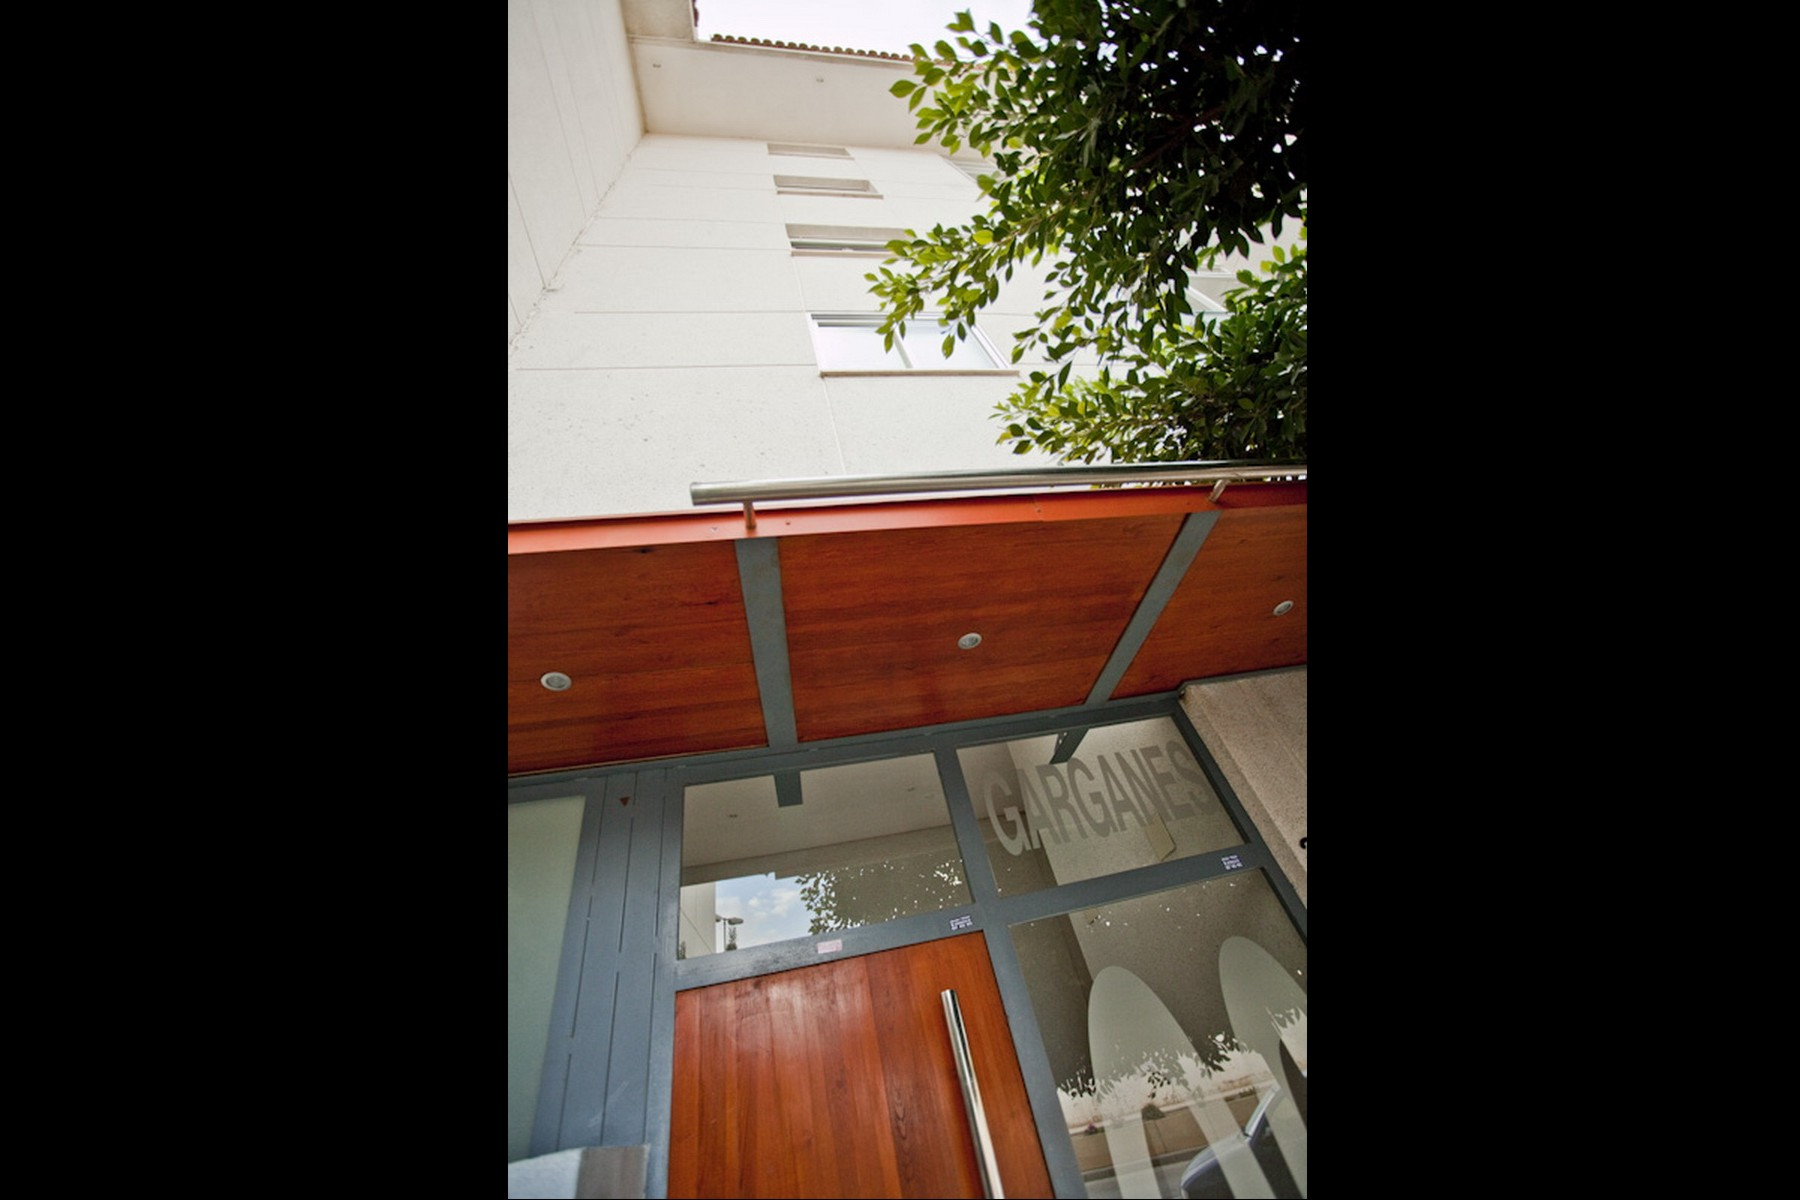 Imaginarq-053-Edificio-Viviendas-Altea-Alicante-04A